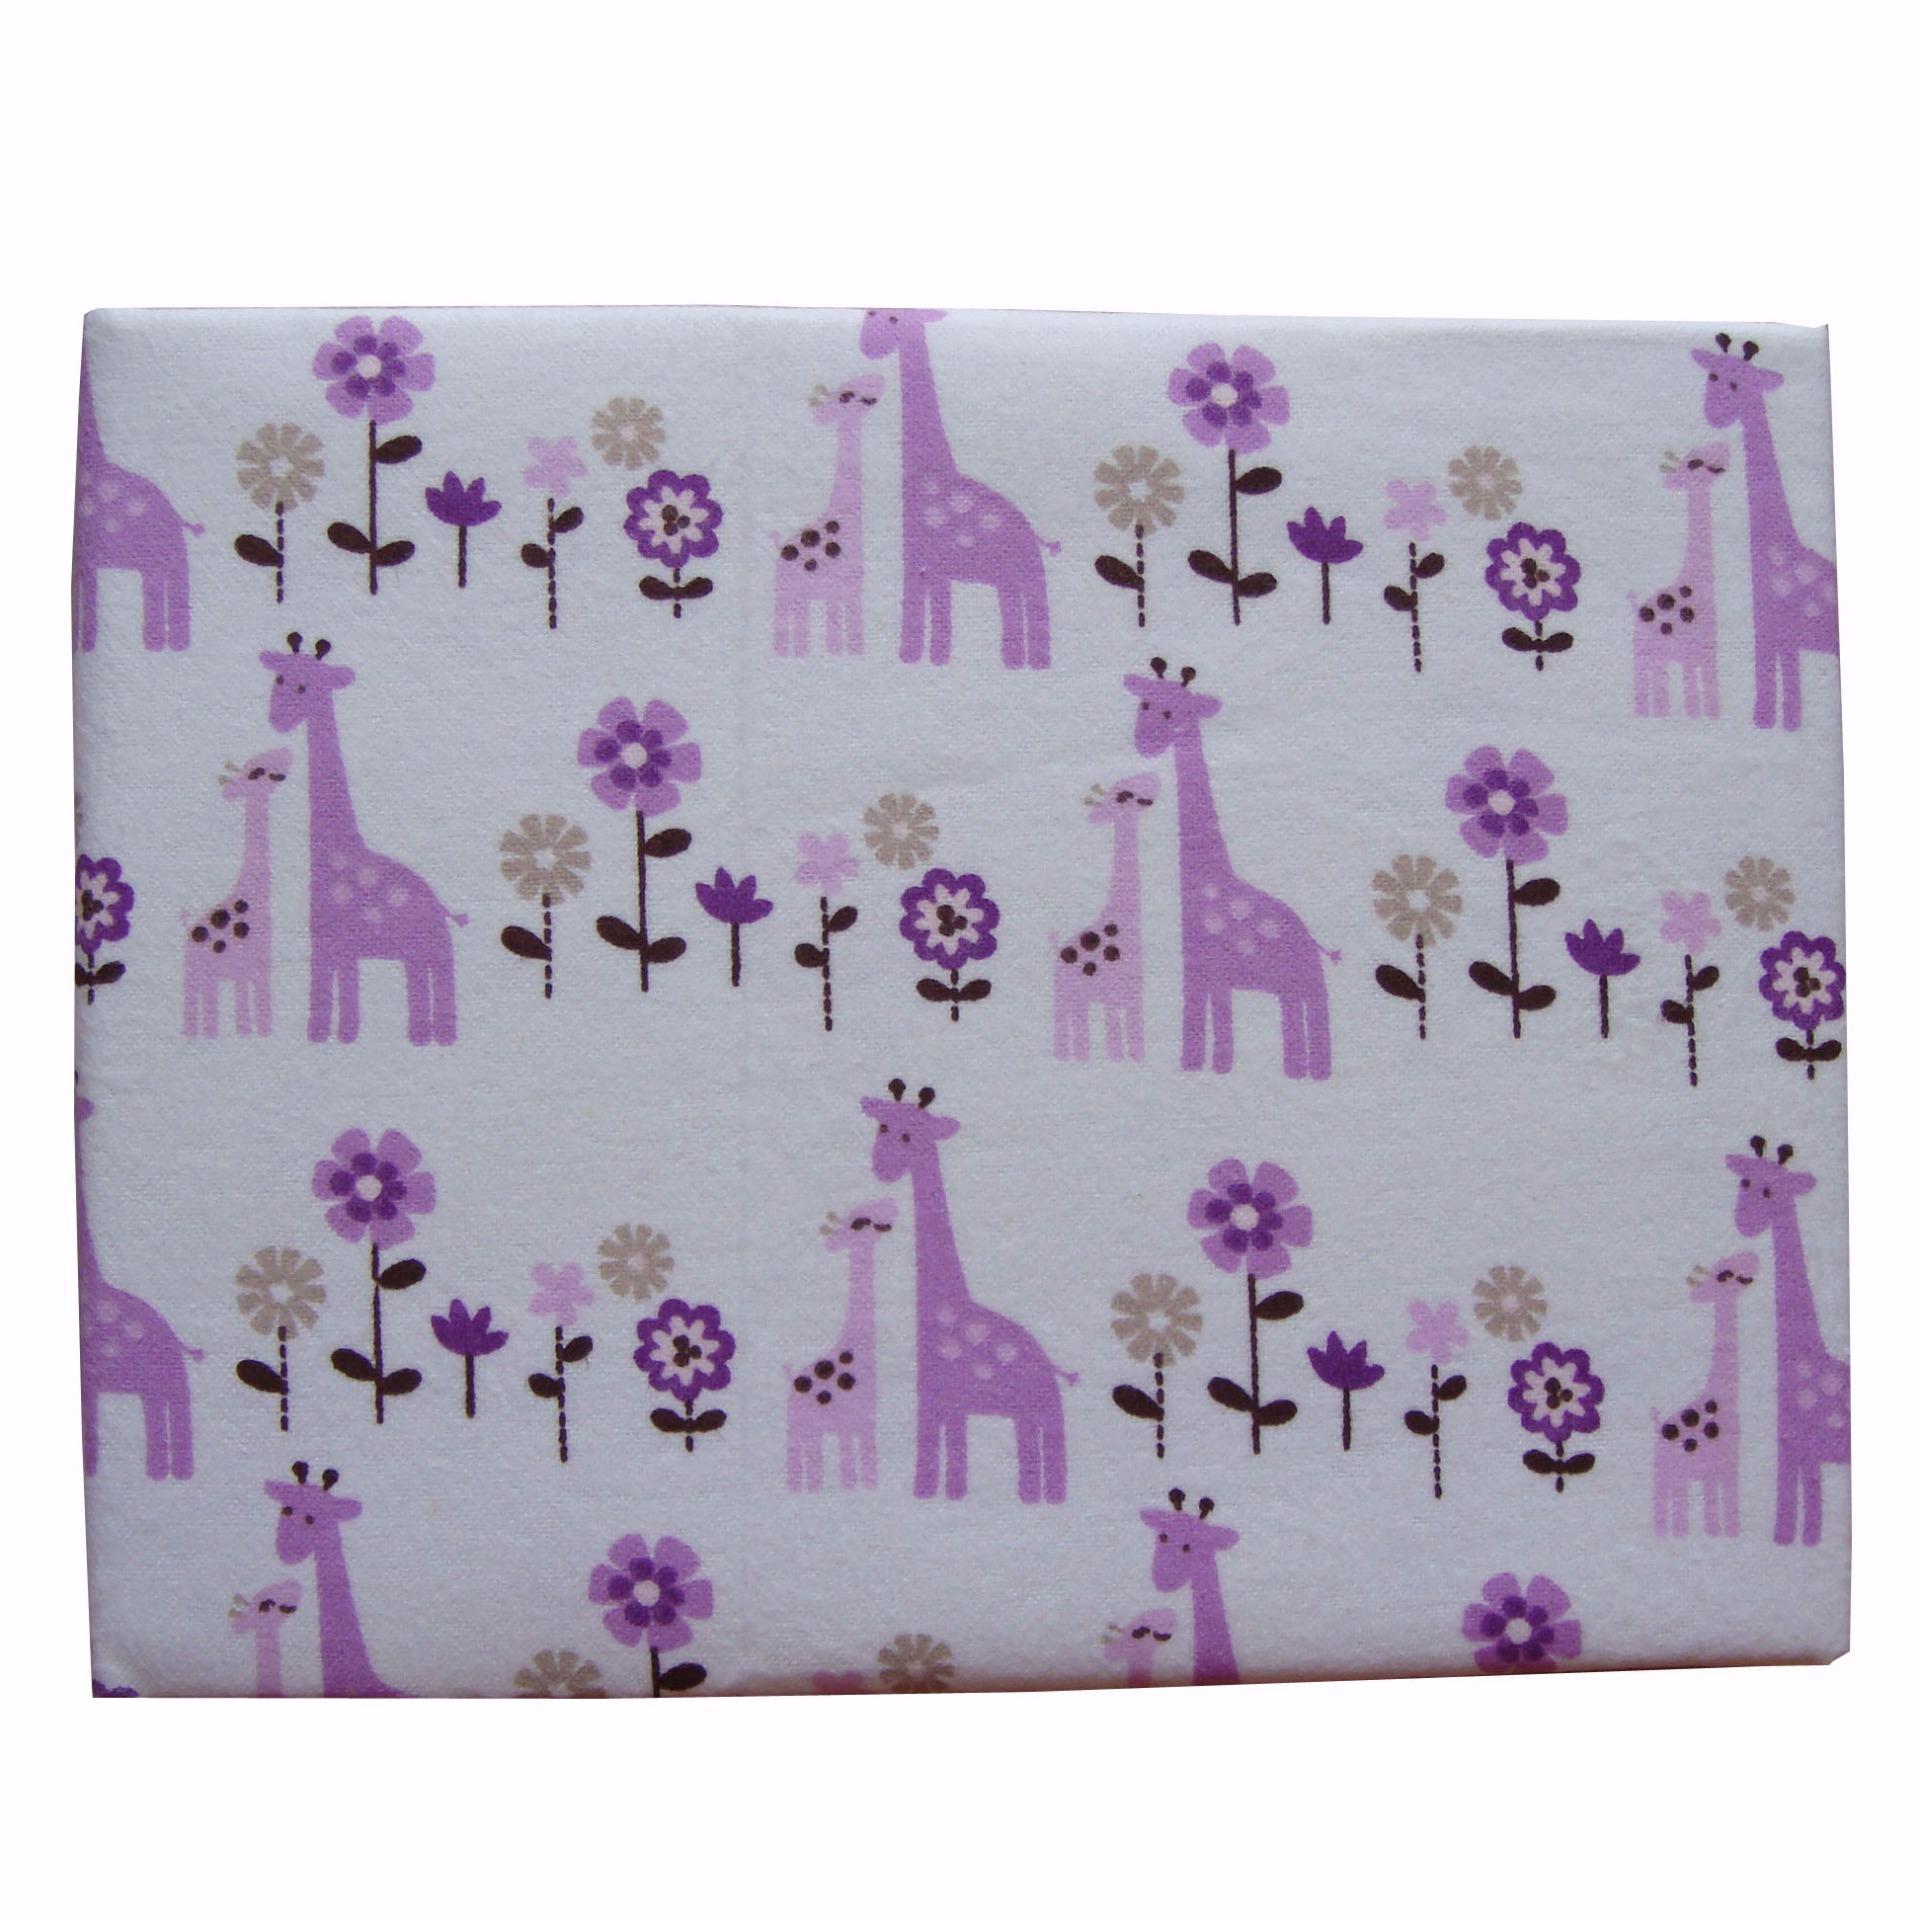 Spesifikasi Mykenzie Baby Keep Me Dry Quilt Pad Perlak Alas Ompol Flanel Waterproof 70X120Cm Giraffe Murah Berkualitas